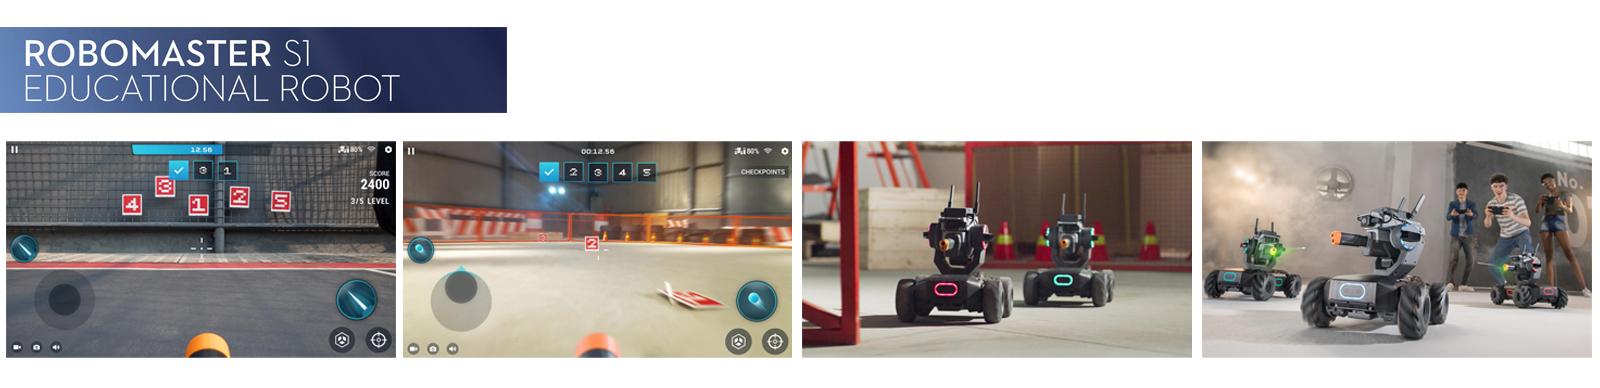 Robomaster S1 Robotics Combat